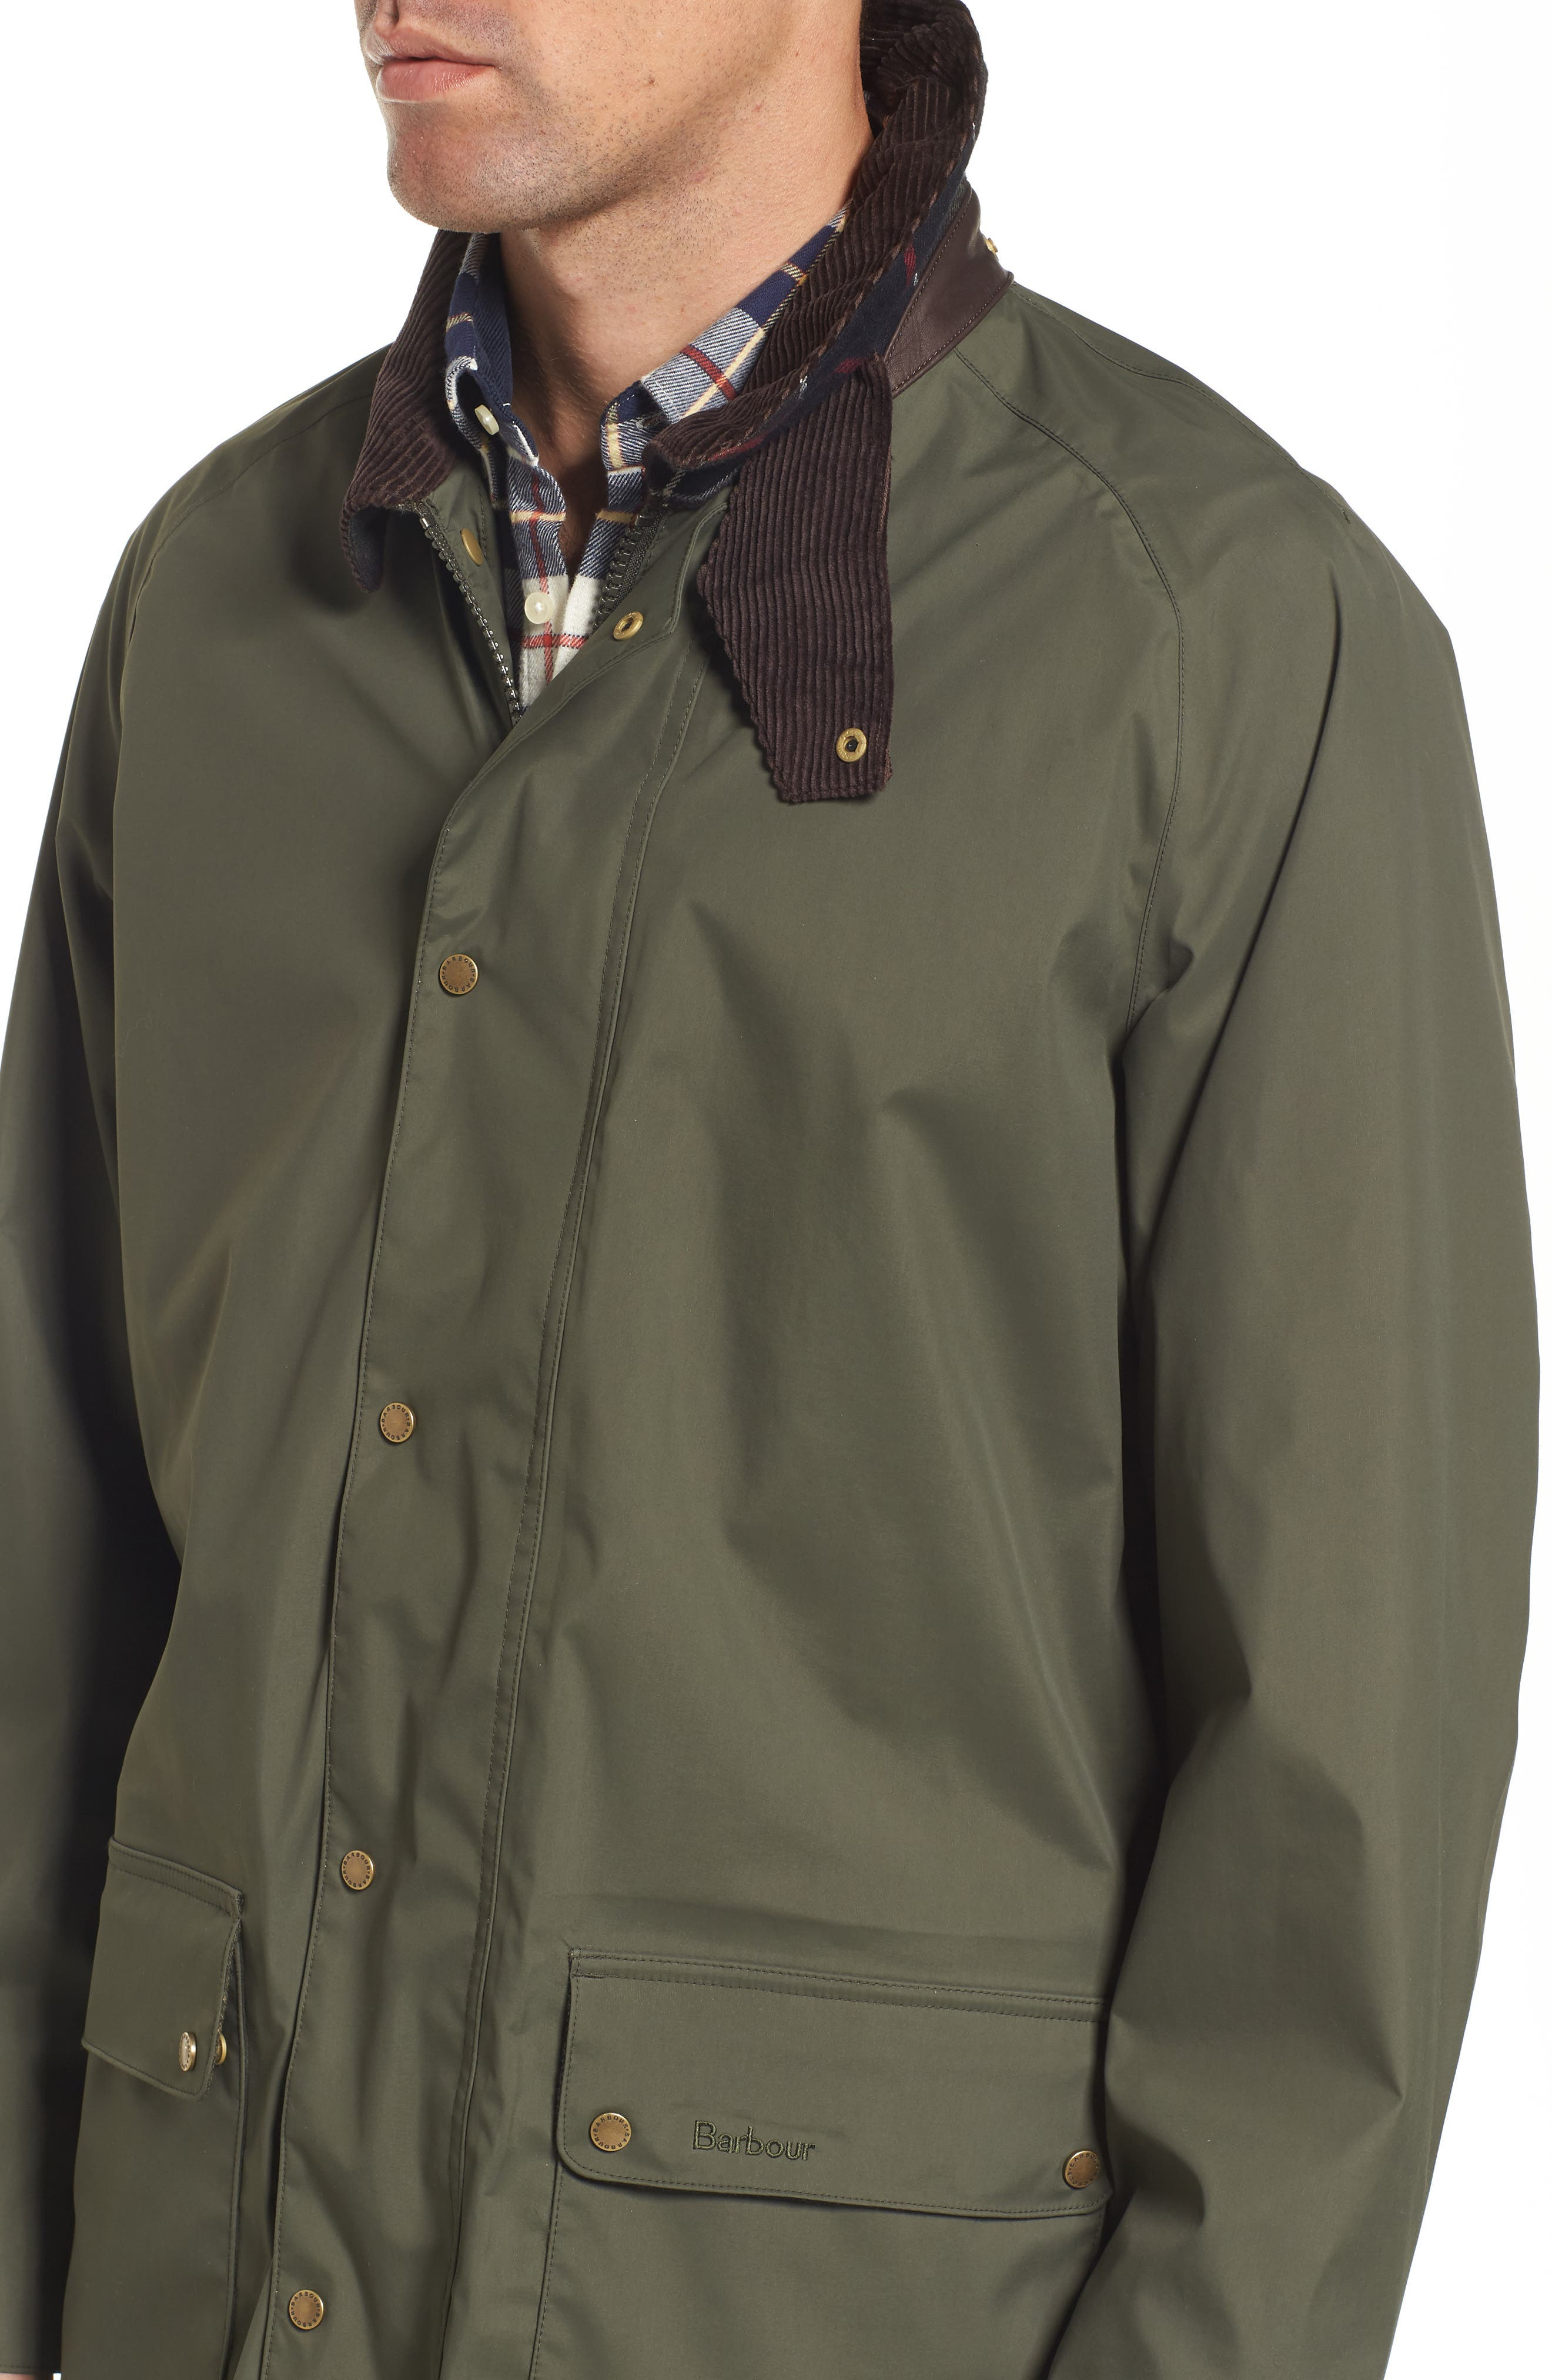 Scarisbrick Waterproof Jacket,                             Alternate thumbnail 4, color,                             340